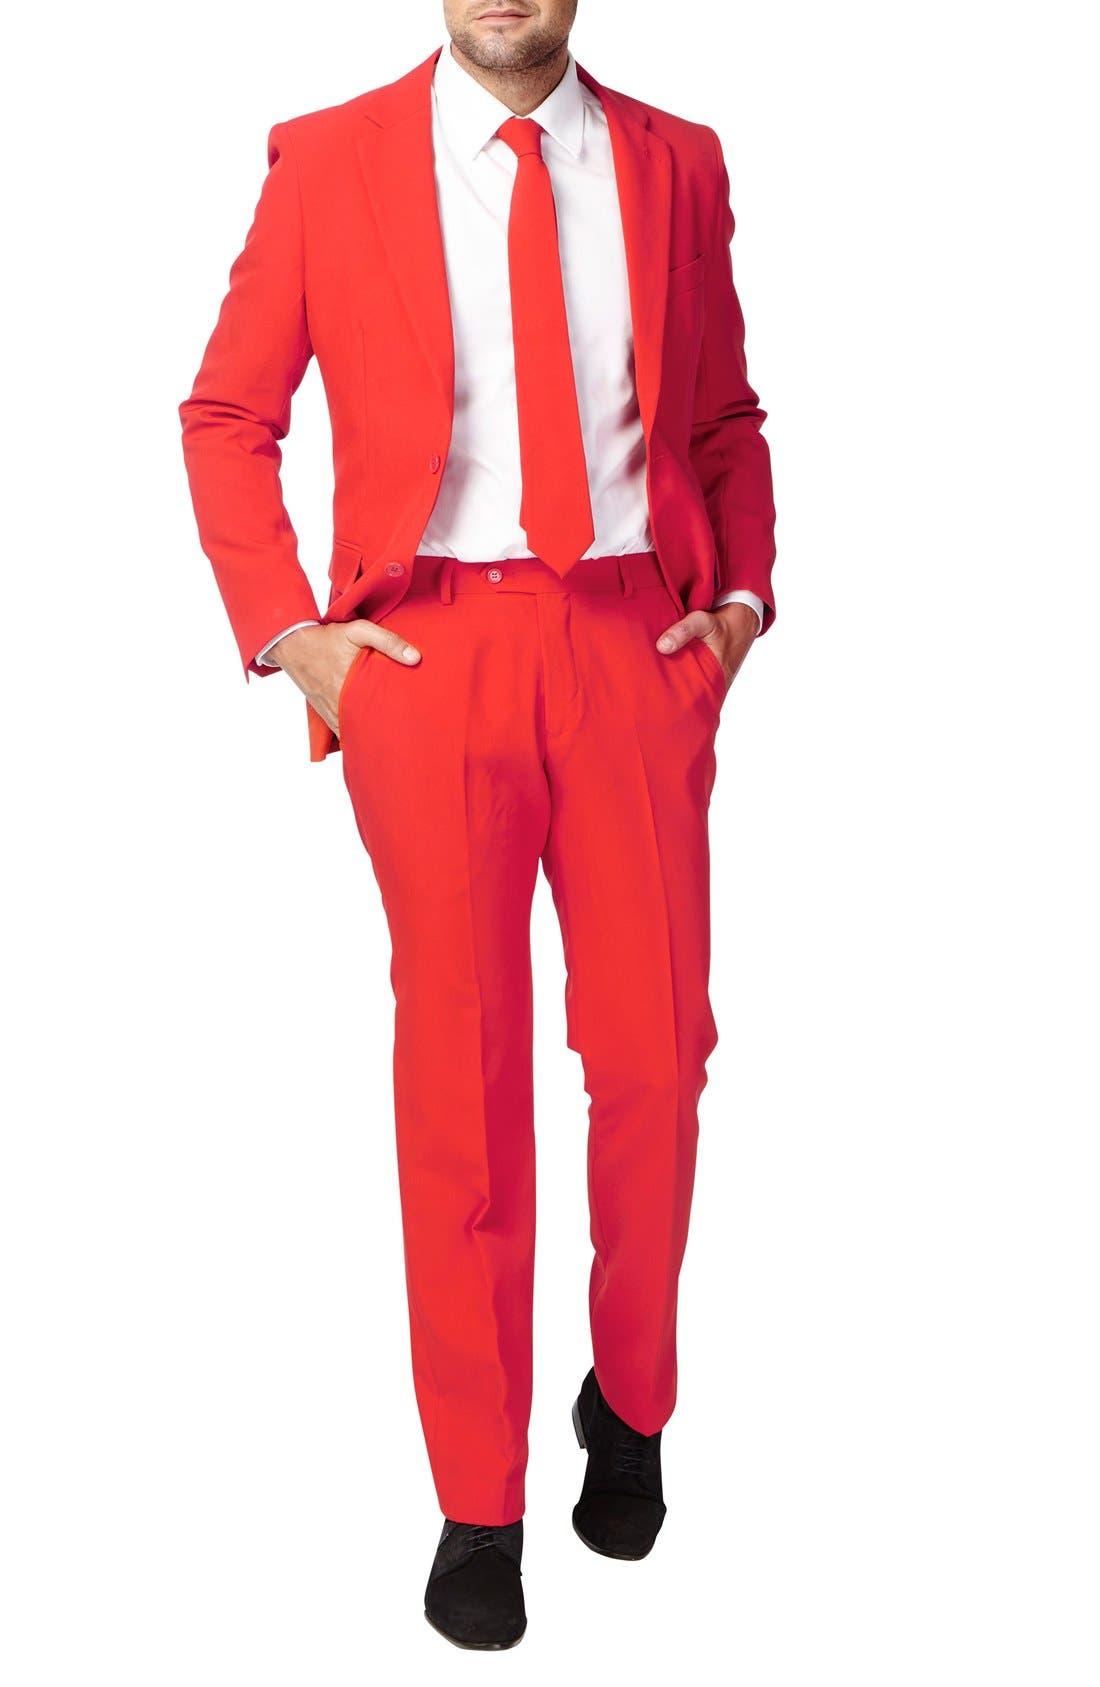 OppoSuit 'Red Devil' Trim Fit Two-Piece Suit with Tie,                             Main thumbnail 1, color,                             610